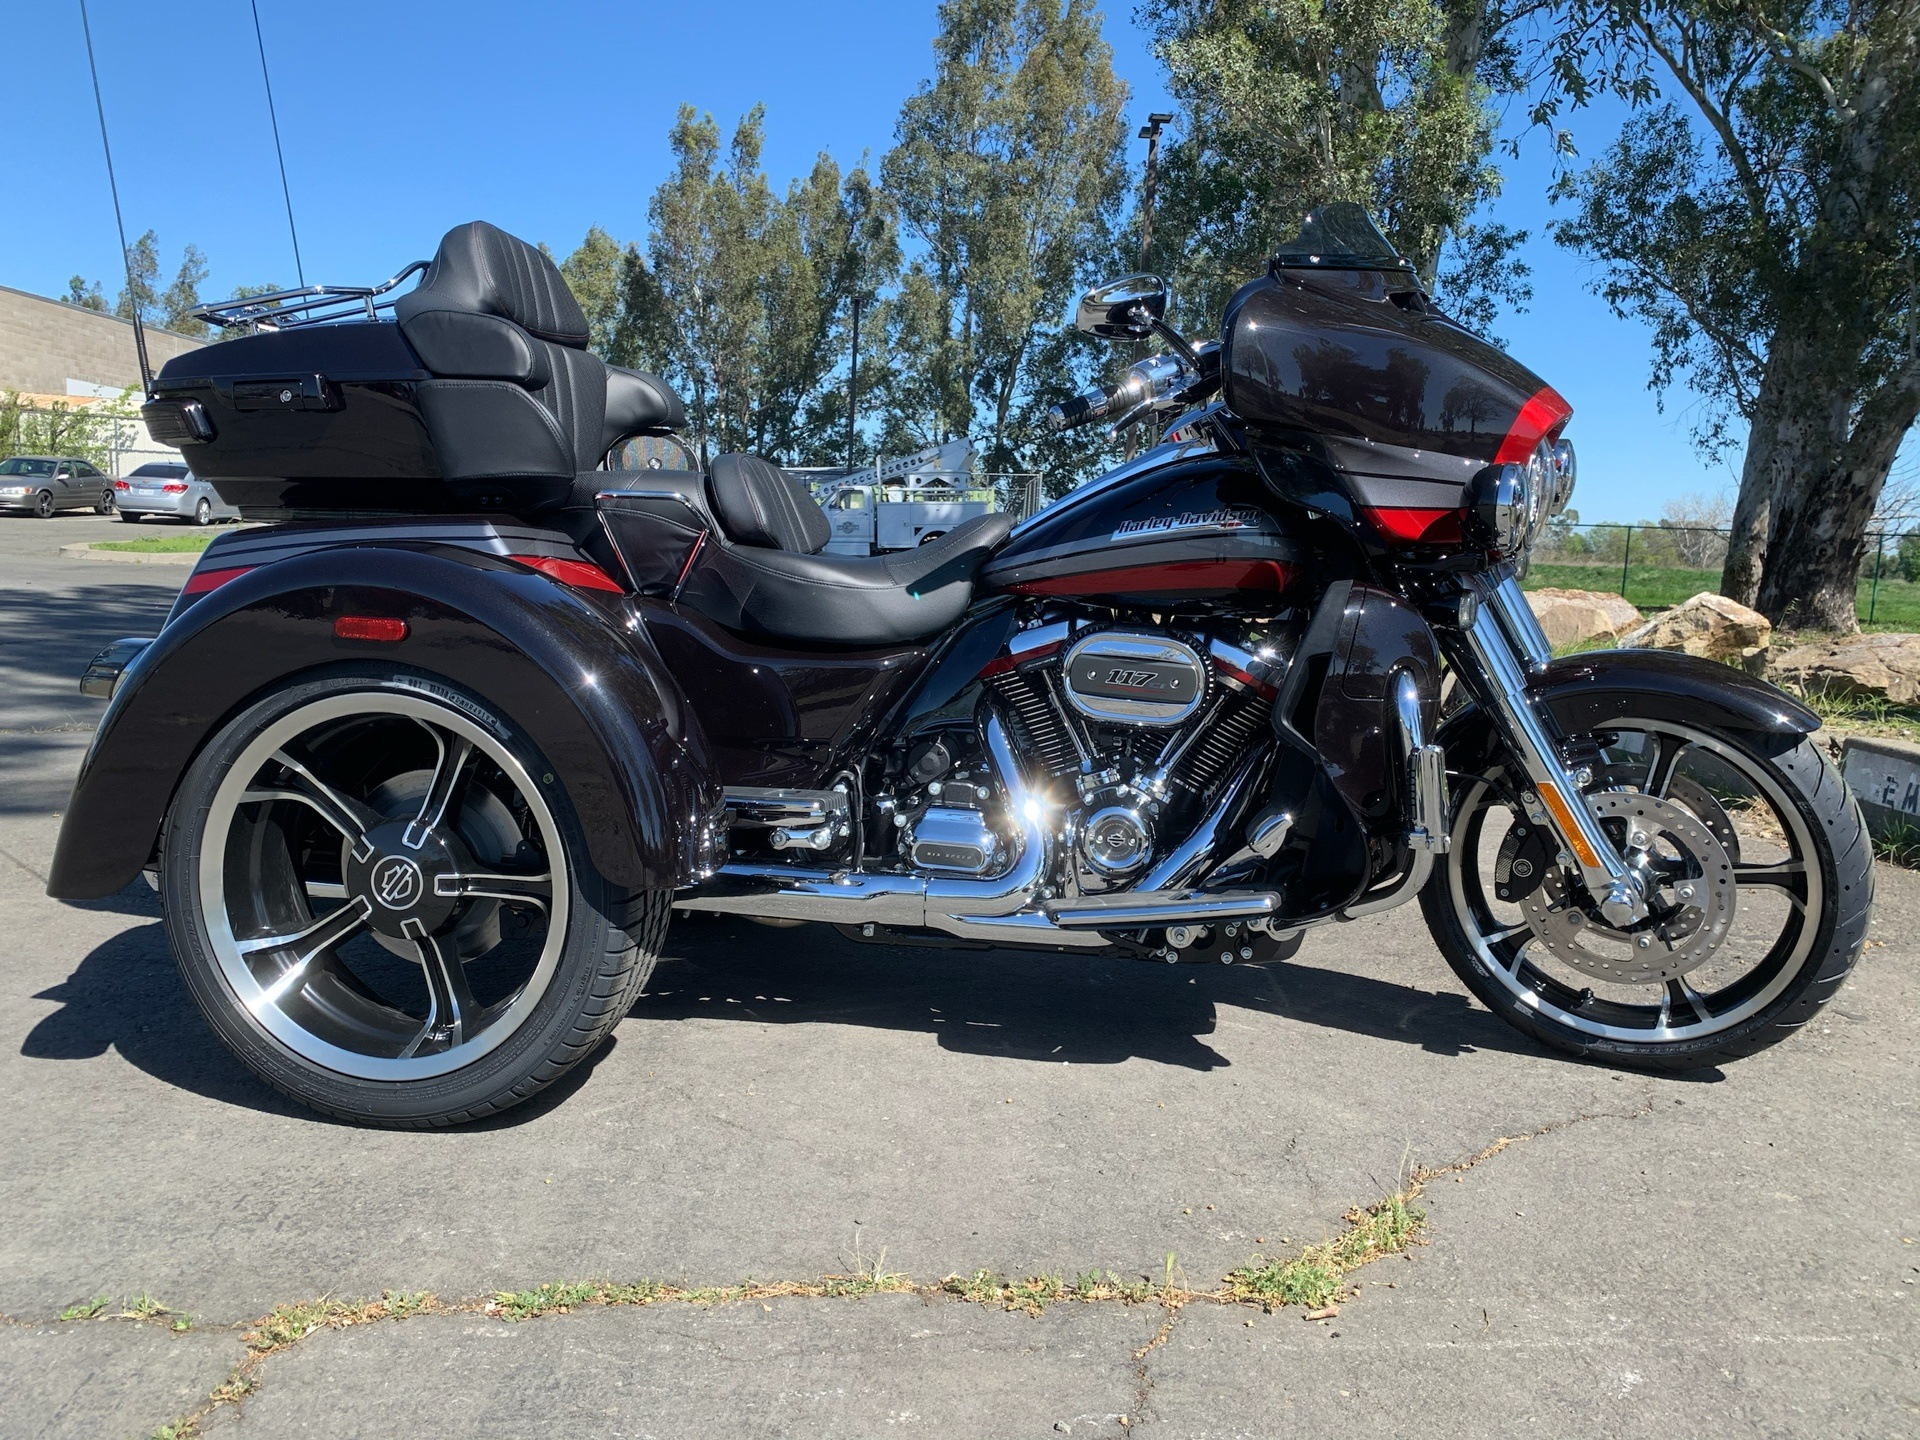 New 2020 Harley-Davidson CVO™ Tri Glide® | Motorcycles in ...